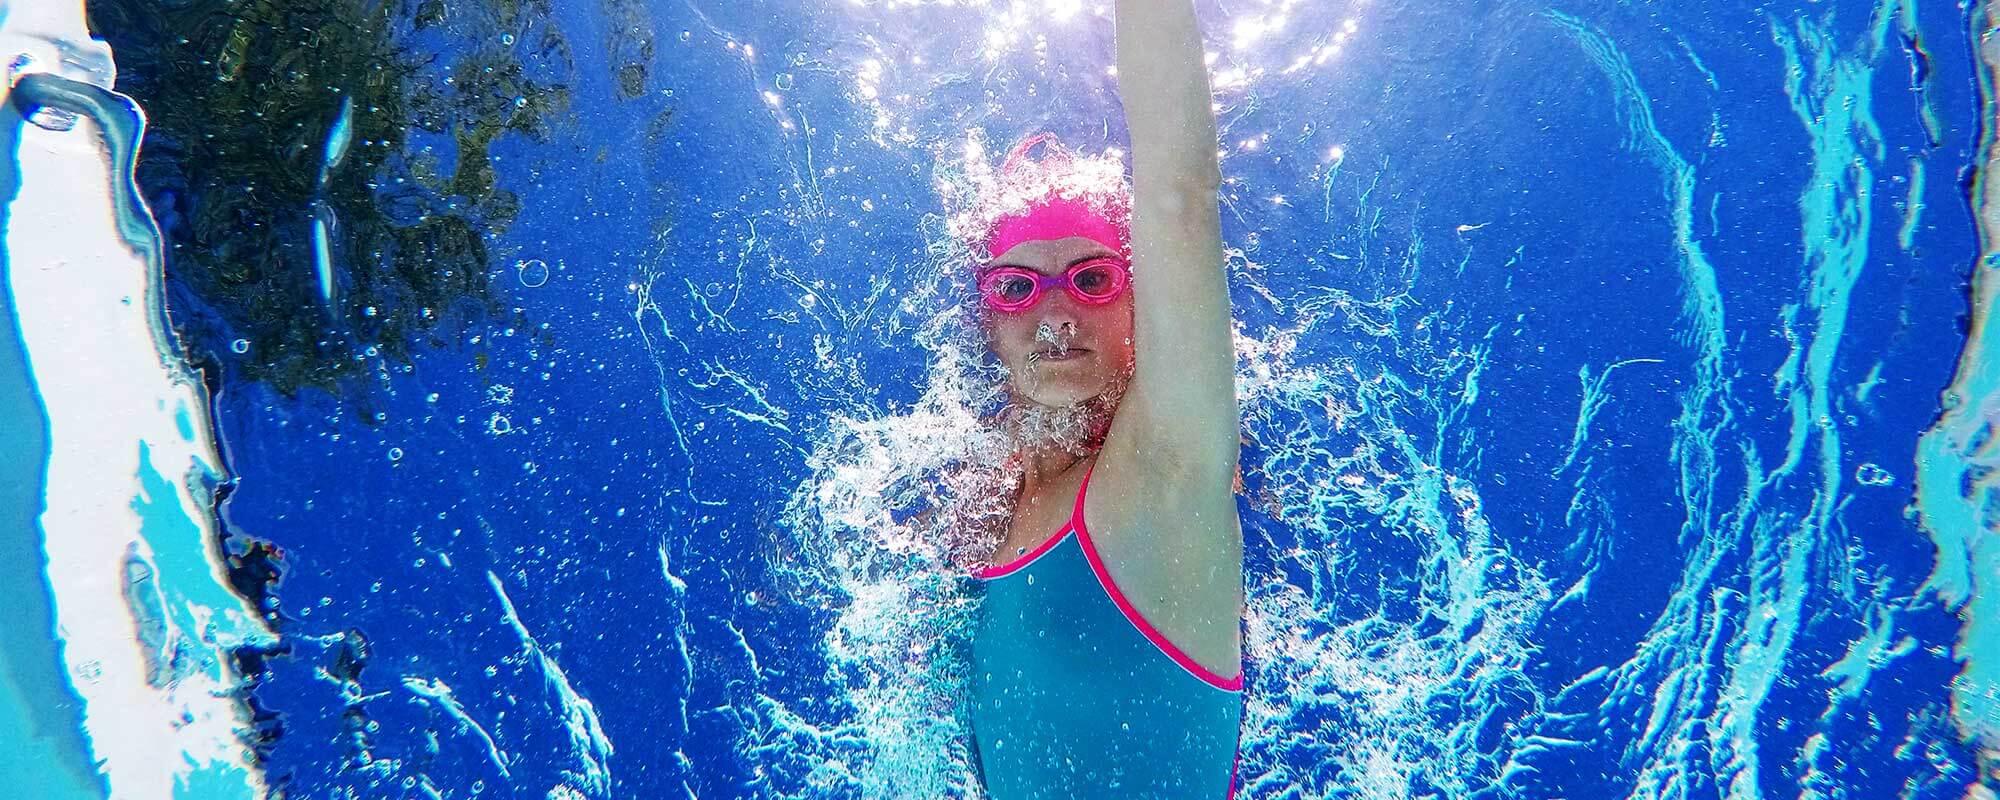 5 Important Tips For an Enjoyable Pool Season